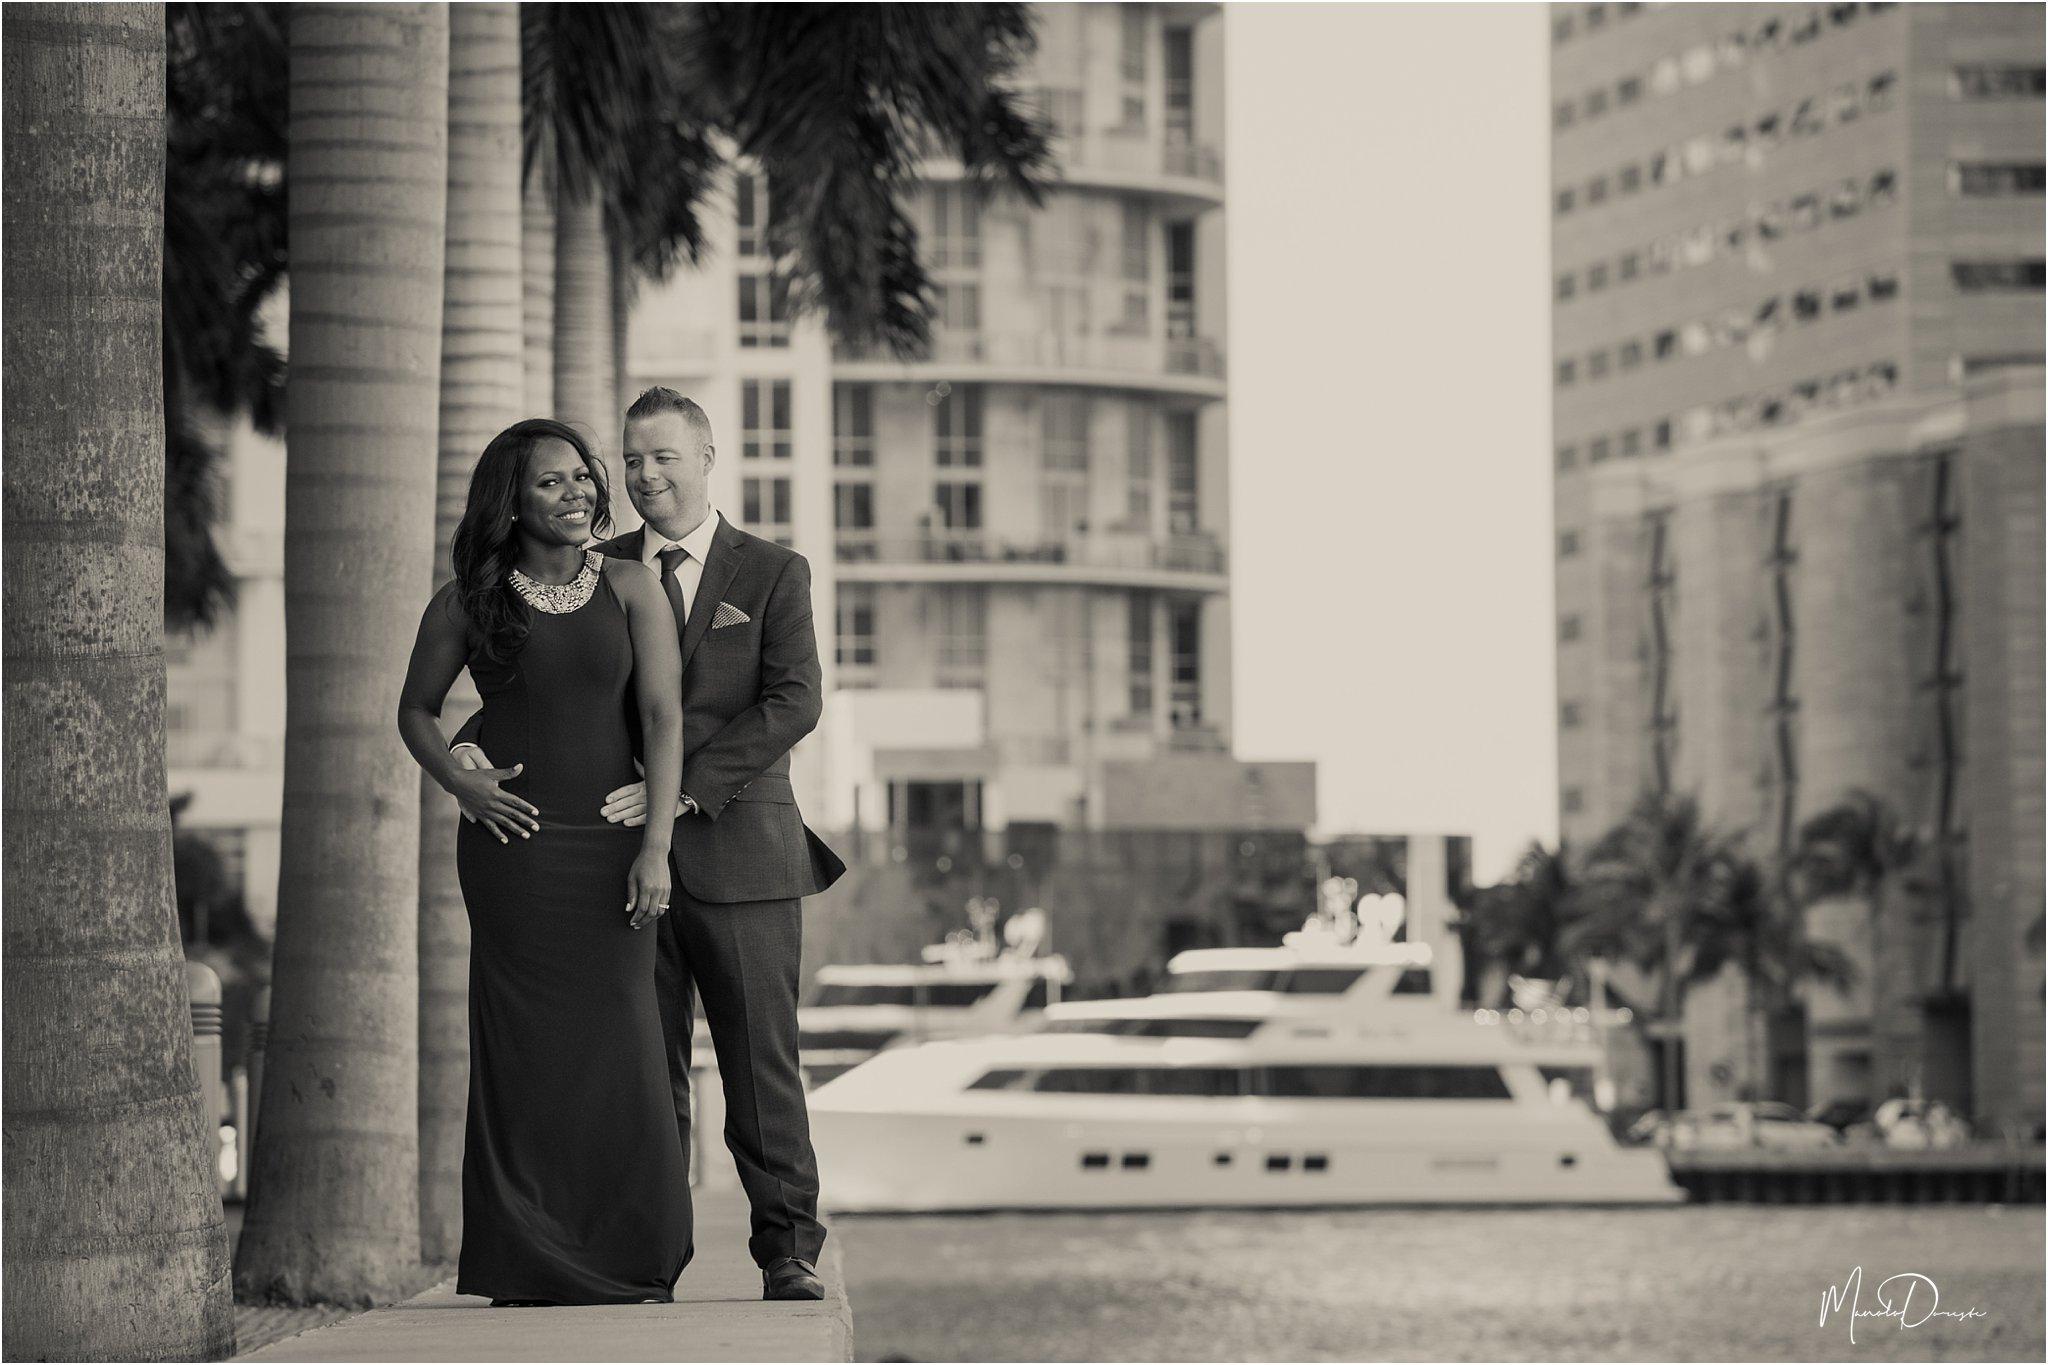 0706_ManoloDoreste_InFocusStudios_Wedding_Family_Photography_Miami_MiamiPhotographer.jpg